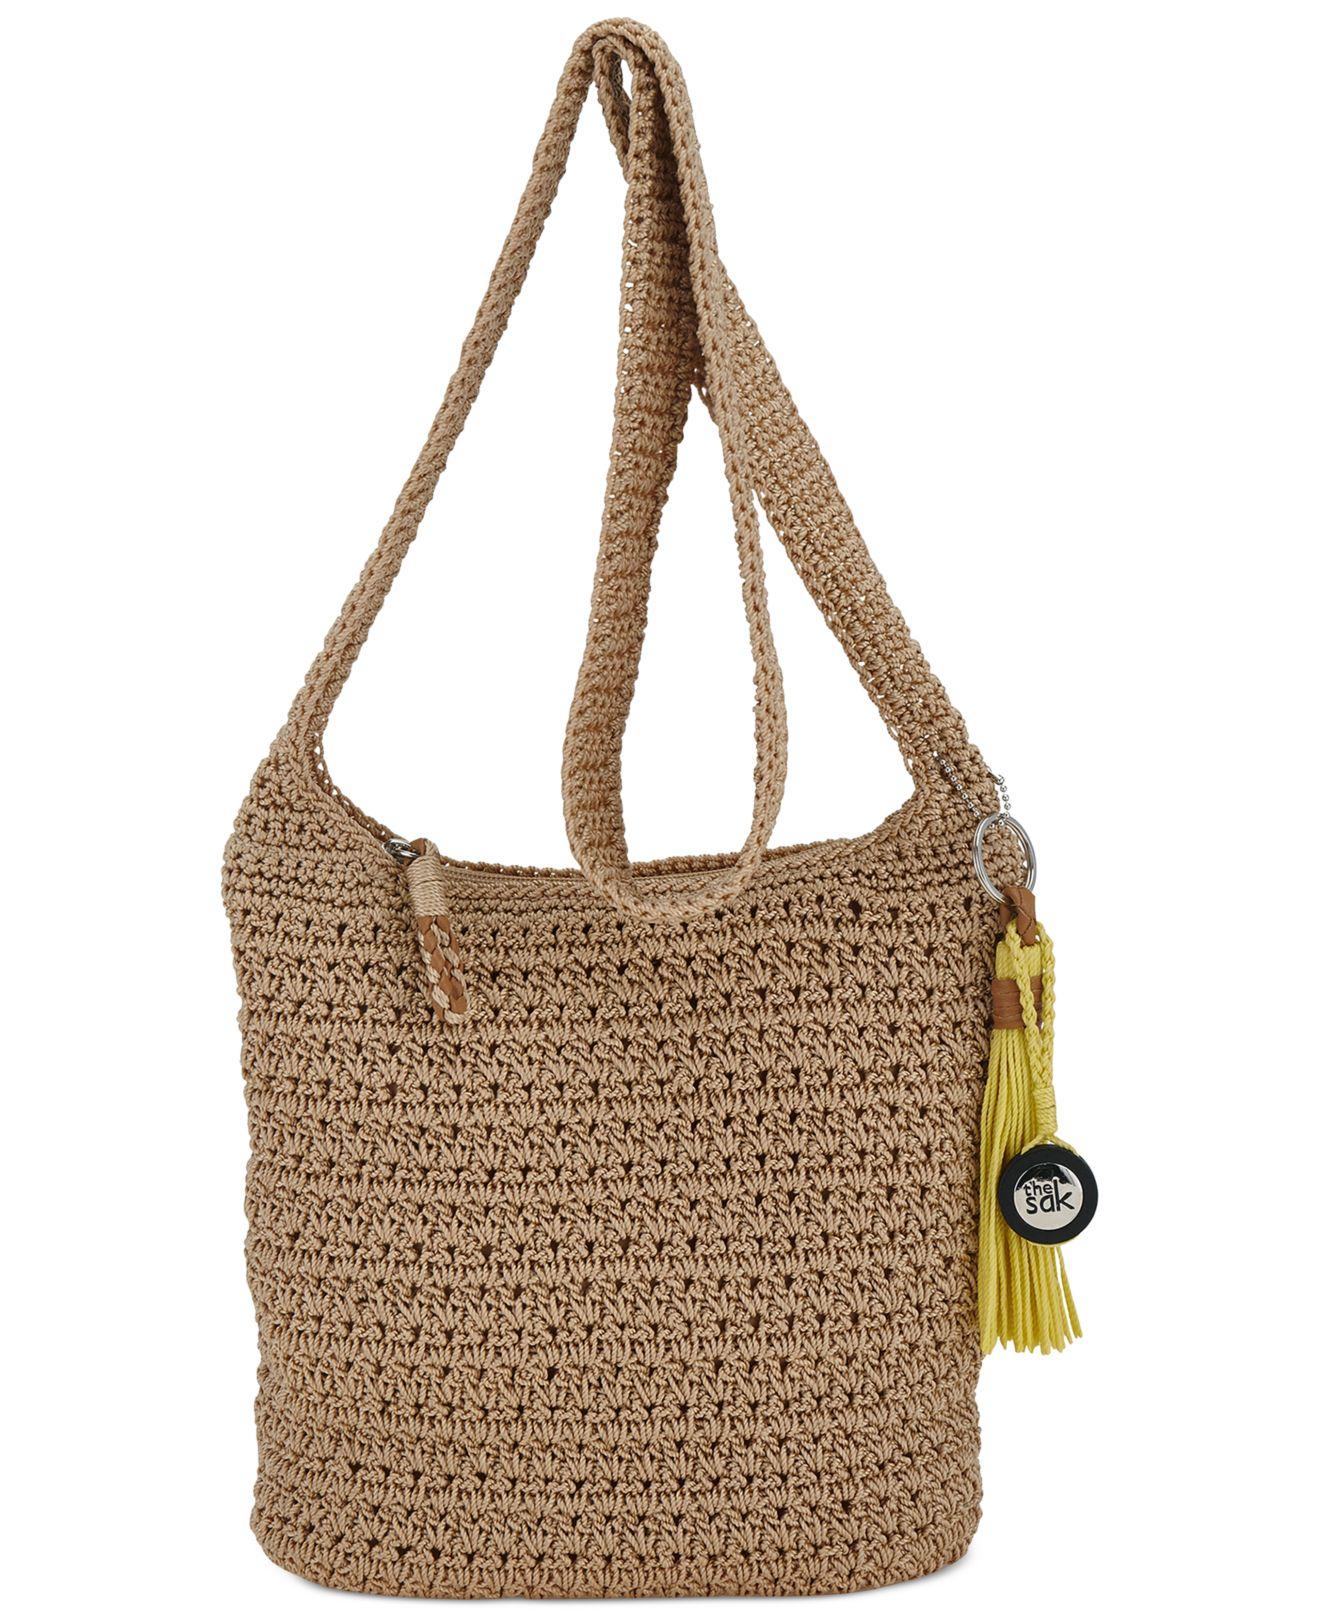 The sak Casual Classics Crochet Crossbody in Brown | Lyst